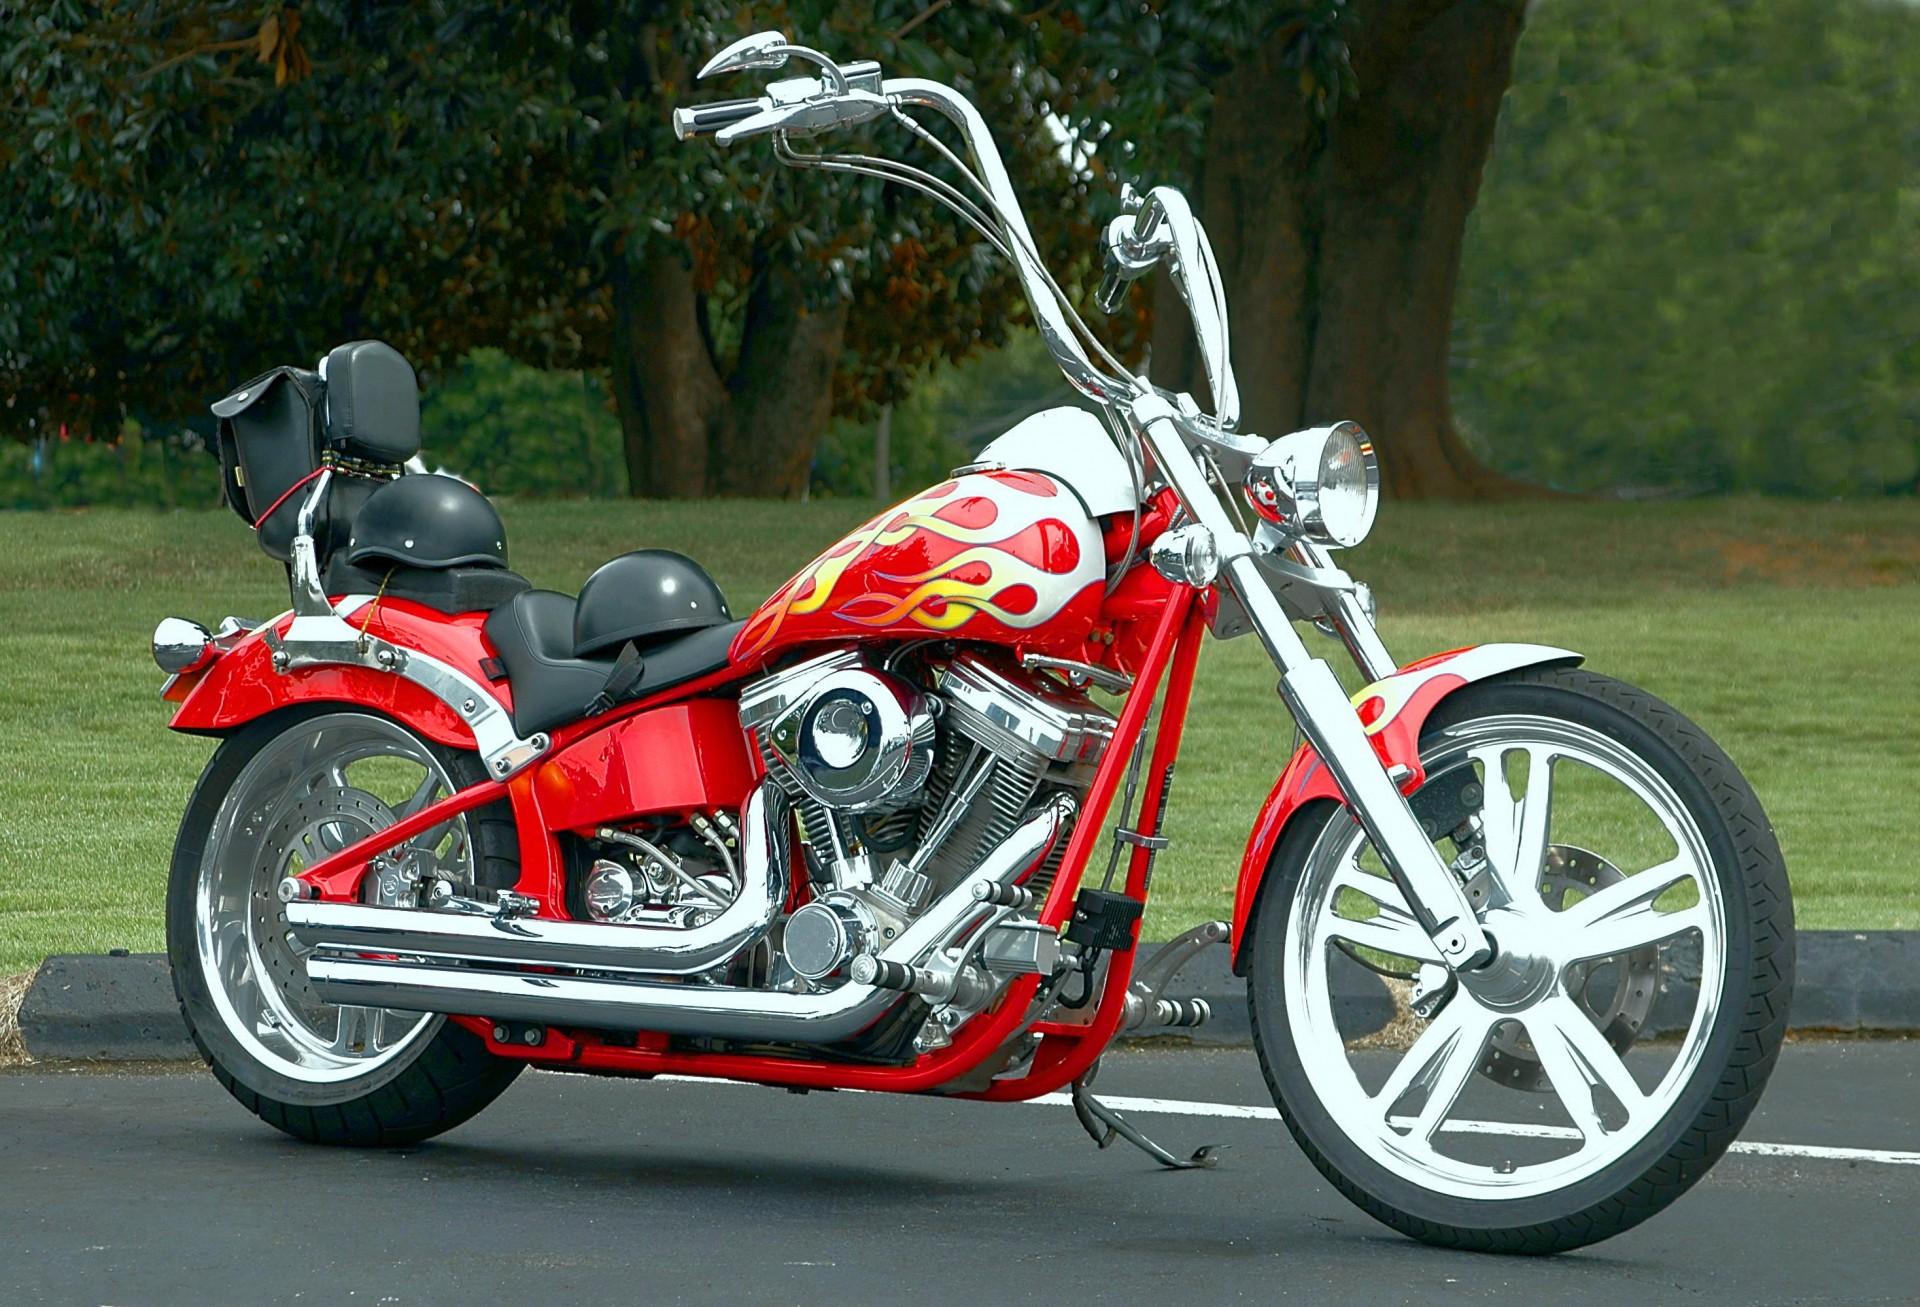 Motorcycles, Bikes, Motor Bikes